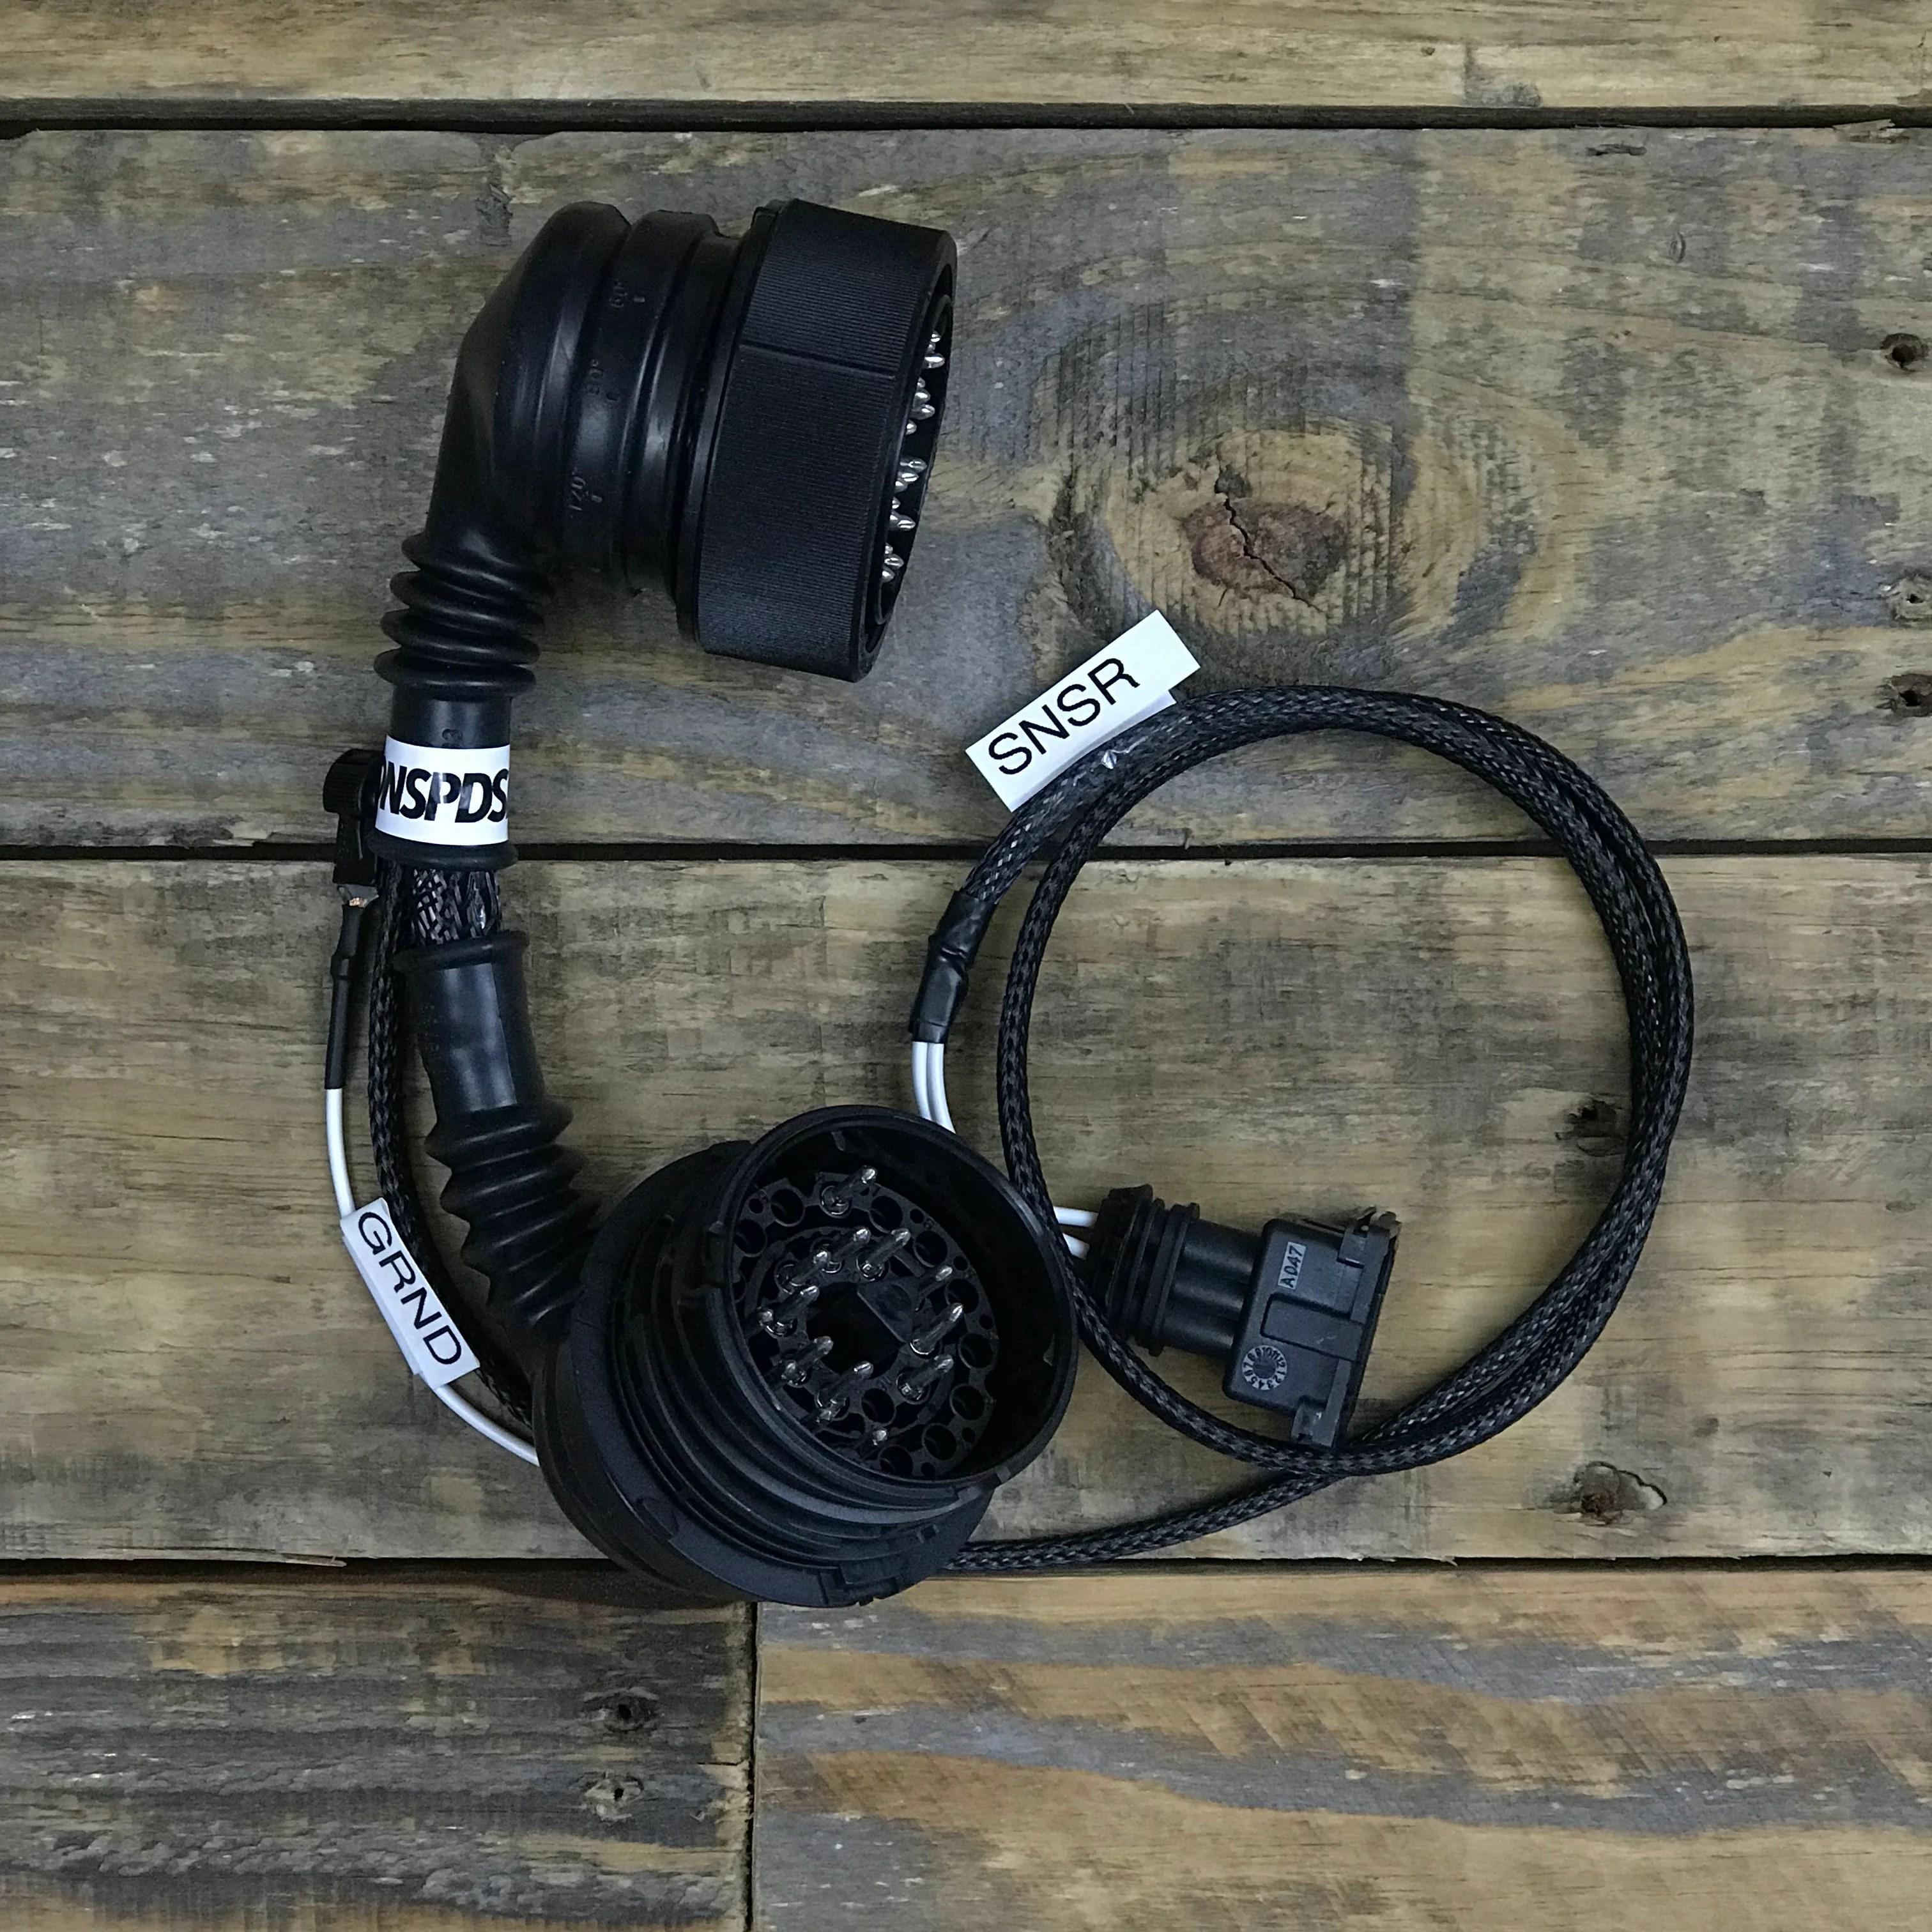 small resolution of e30 m50 s50 m52 s52 swap wiring harness adapter u2013 condor speed